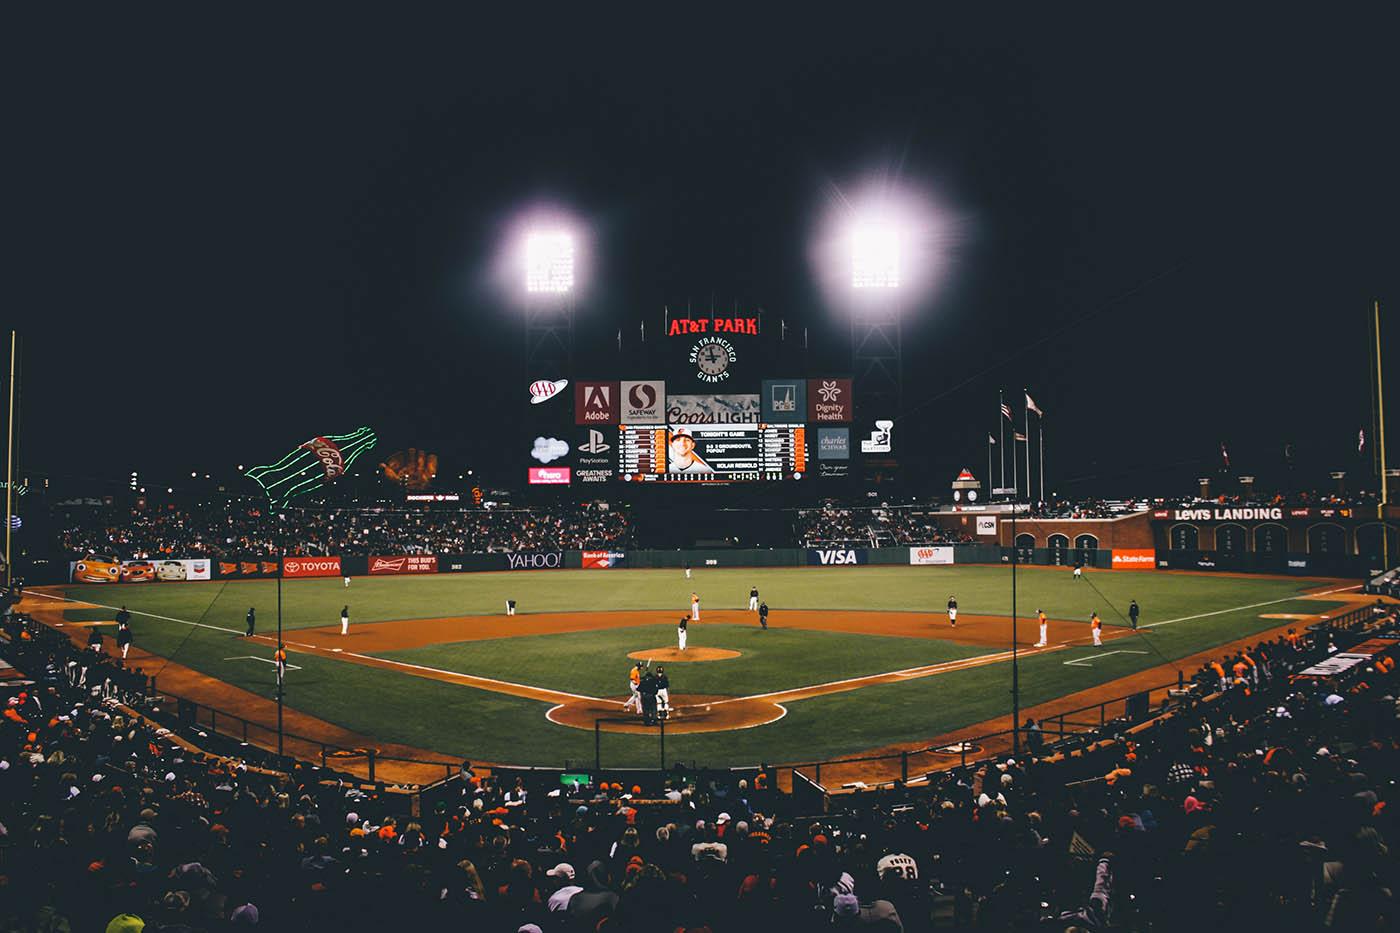 quand voir un match de baseball ?